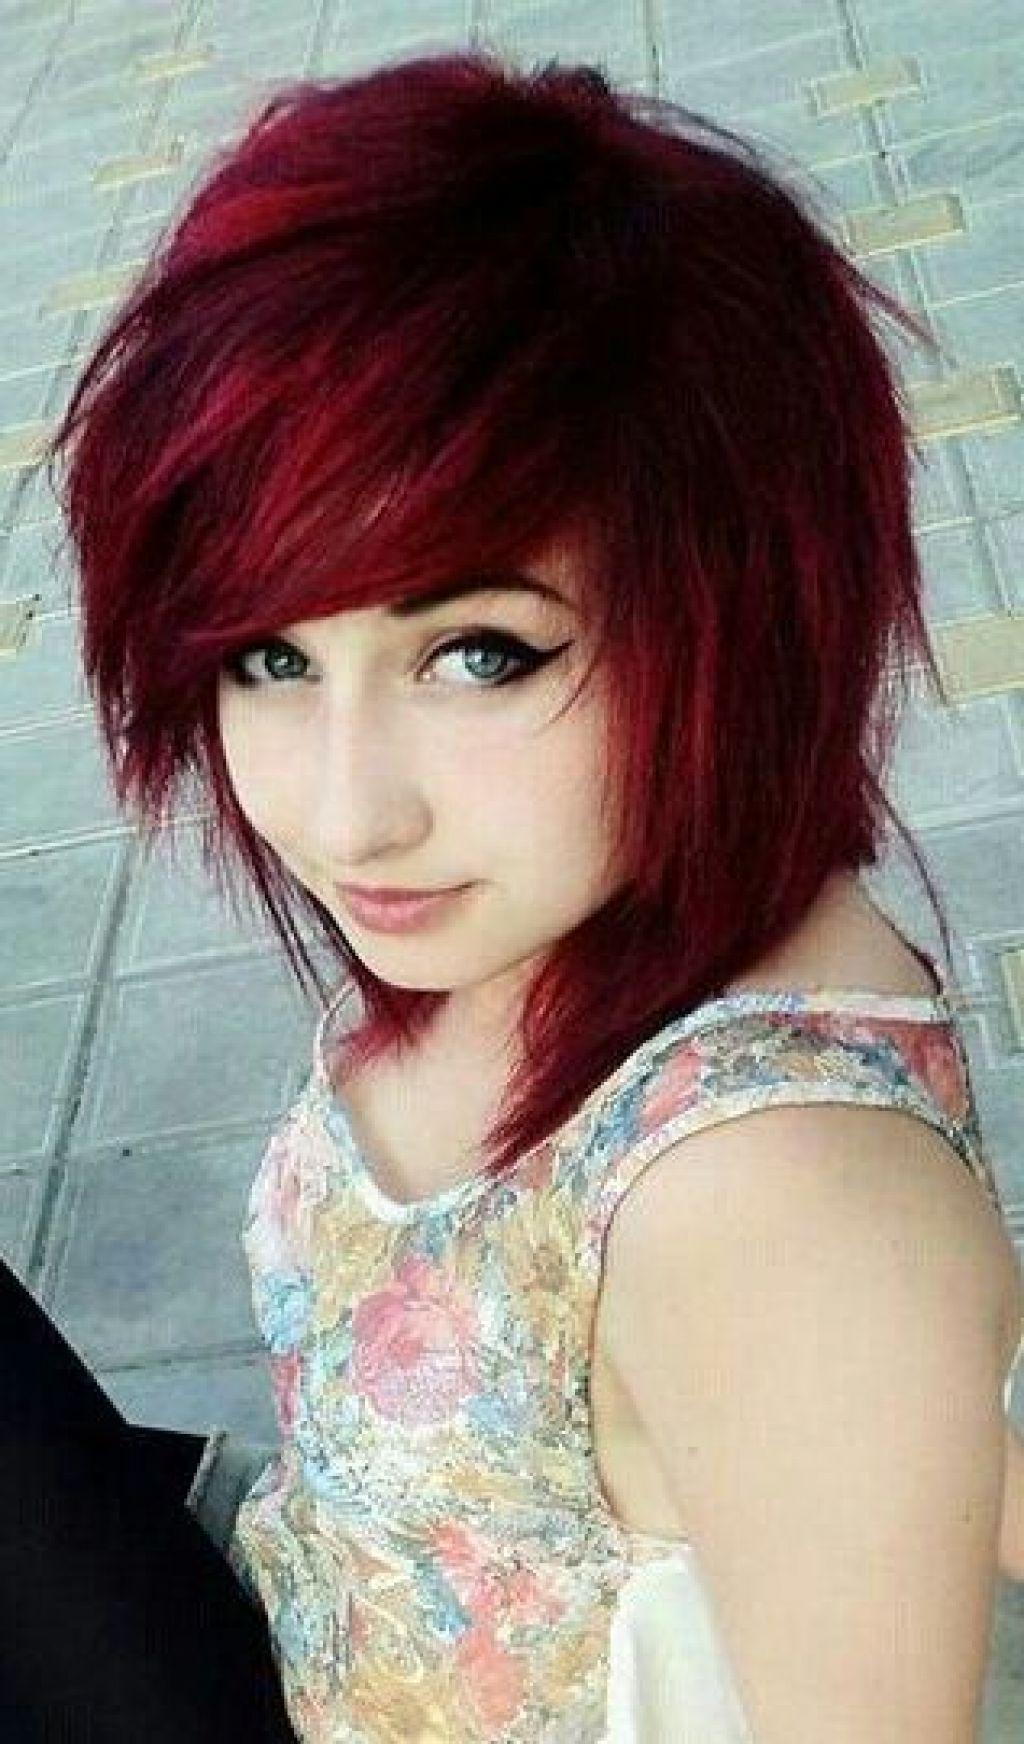 Emo Hairstyles For Girls Short Emo Girl Hairstyles For Medium Hair